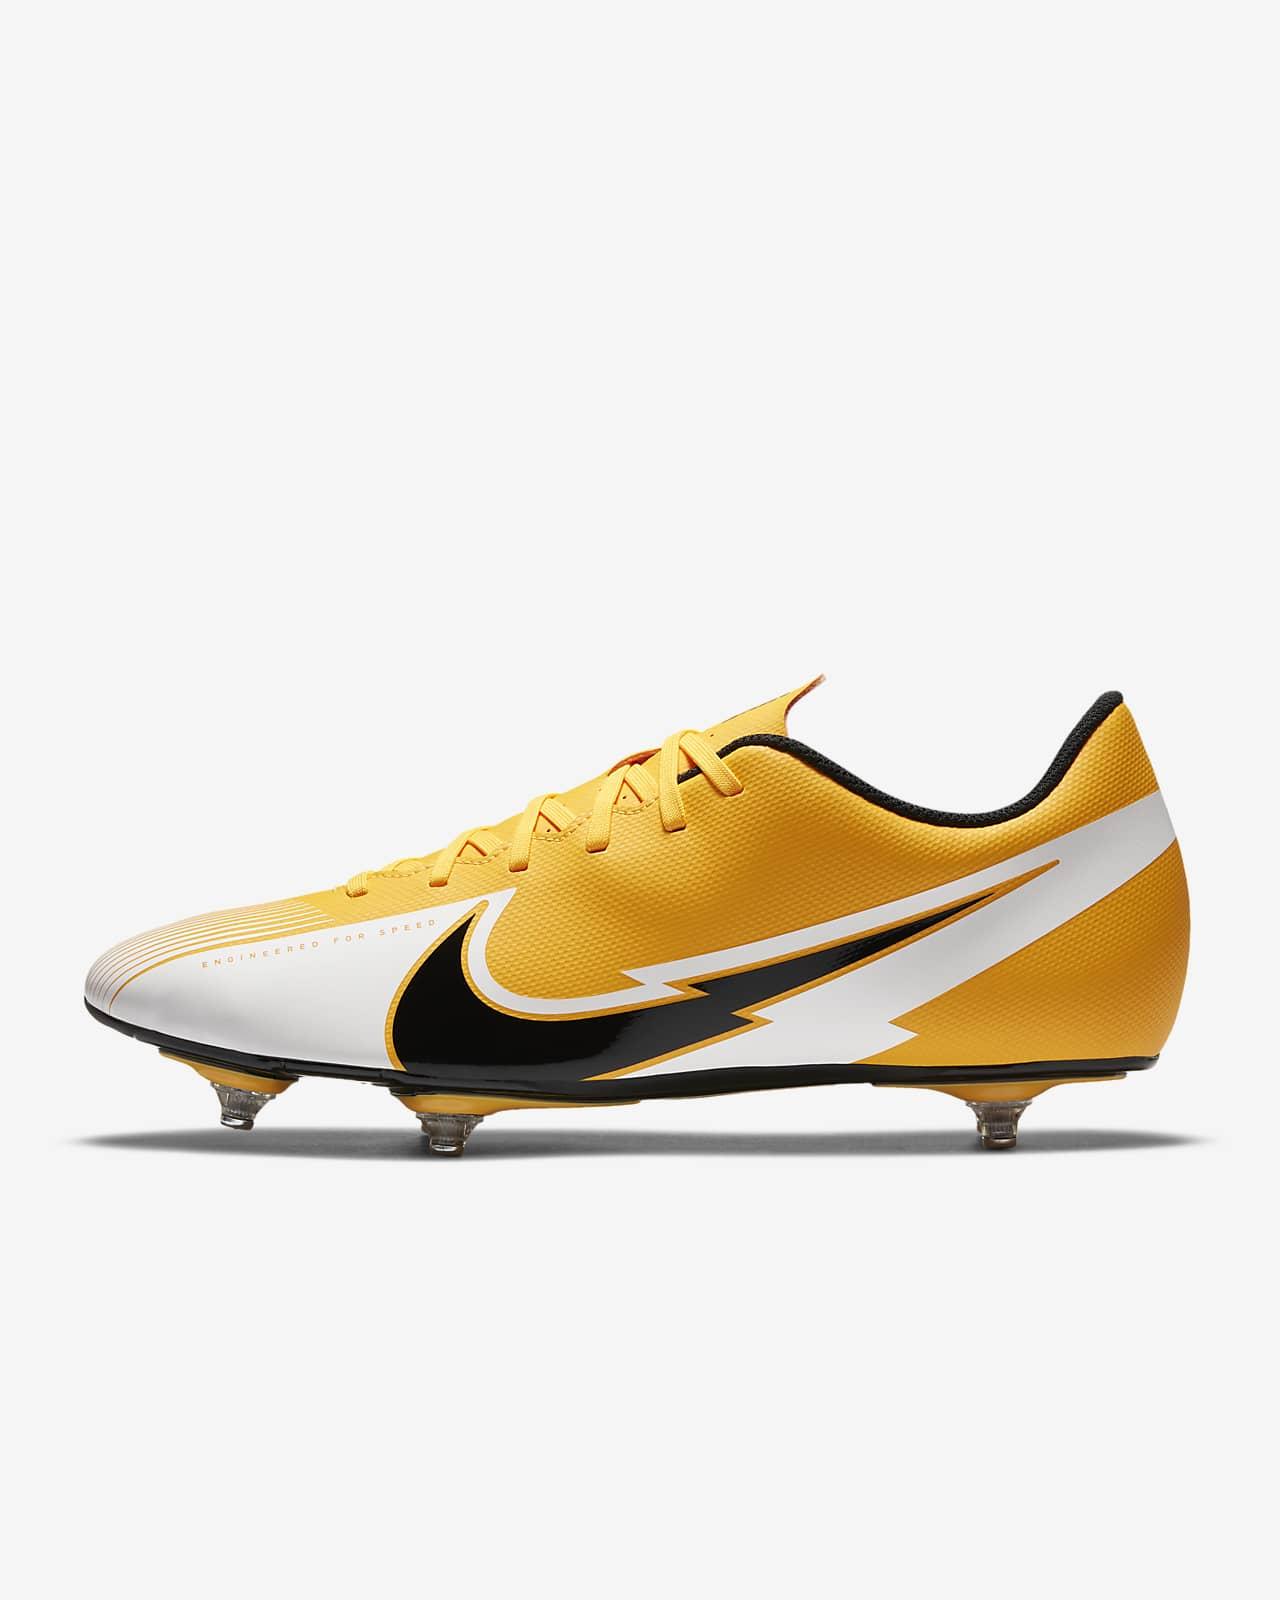 Club SG Soft-Ground Football Boot. Nike CZ